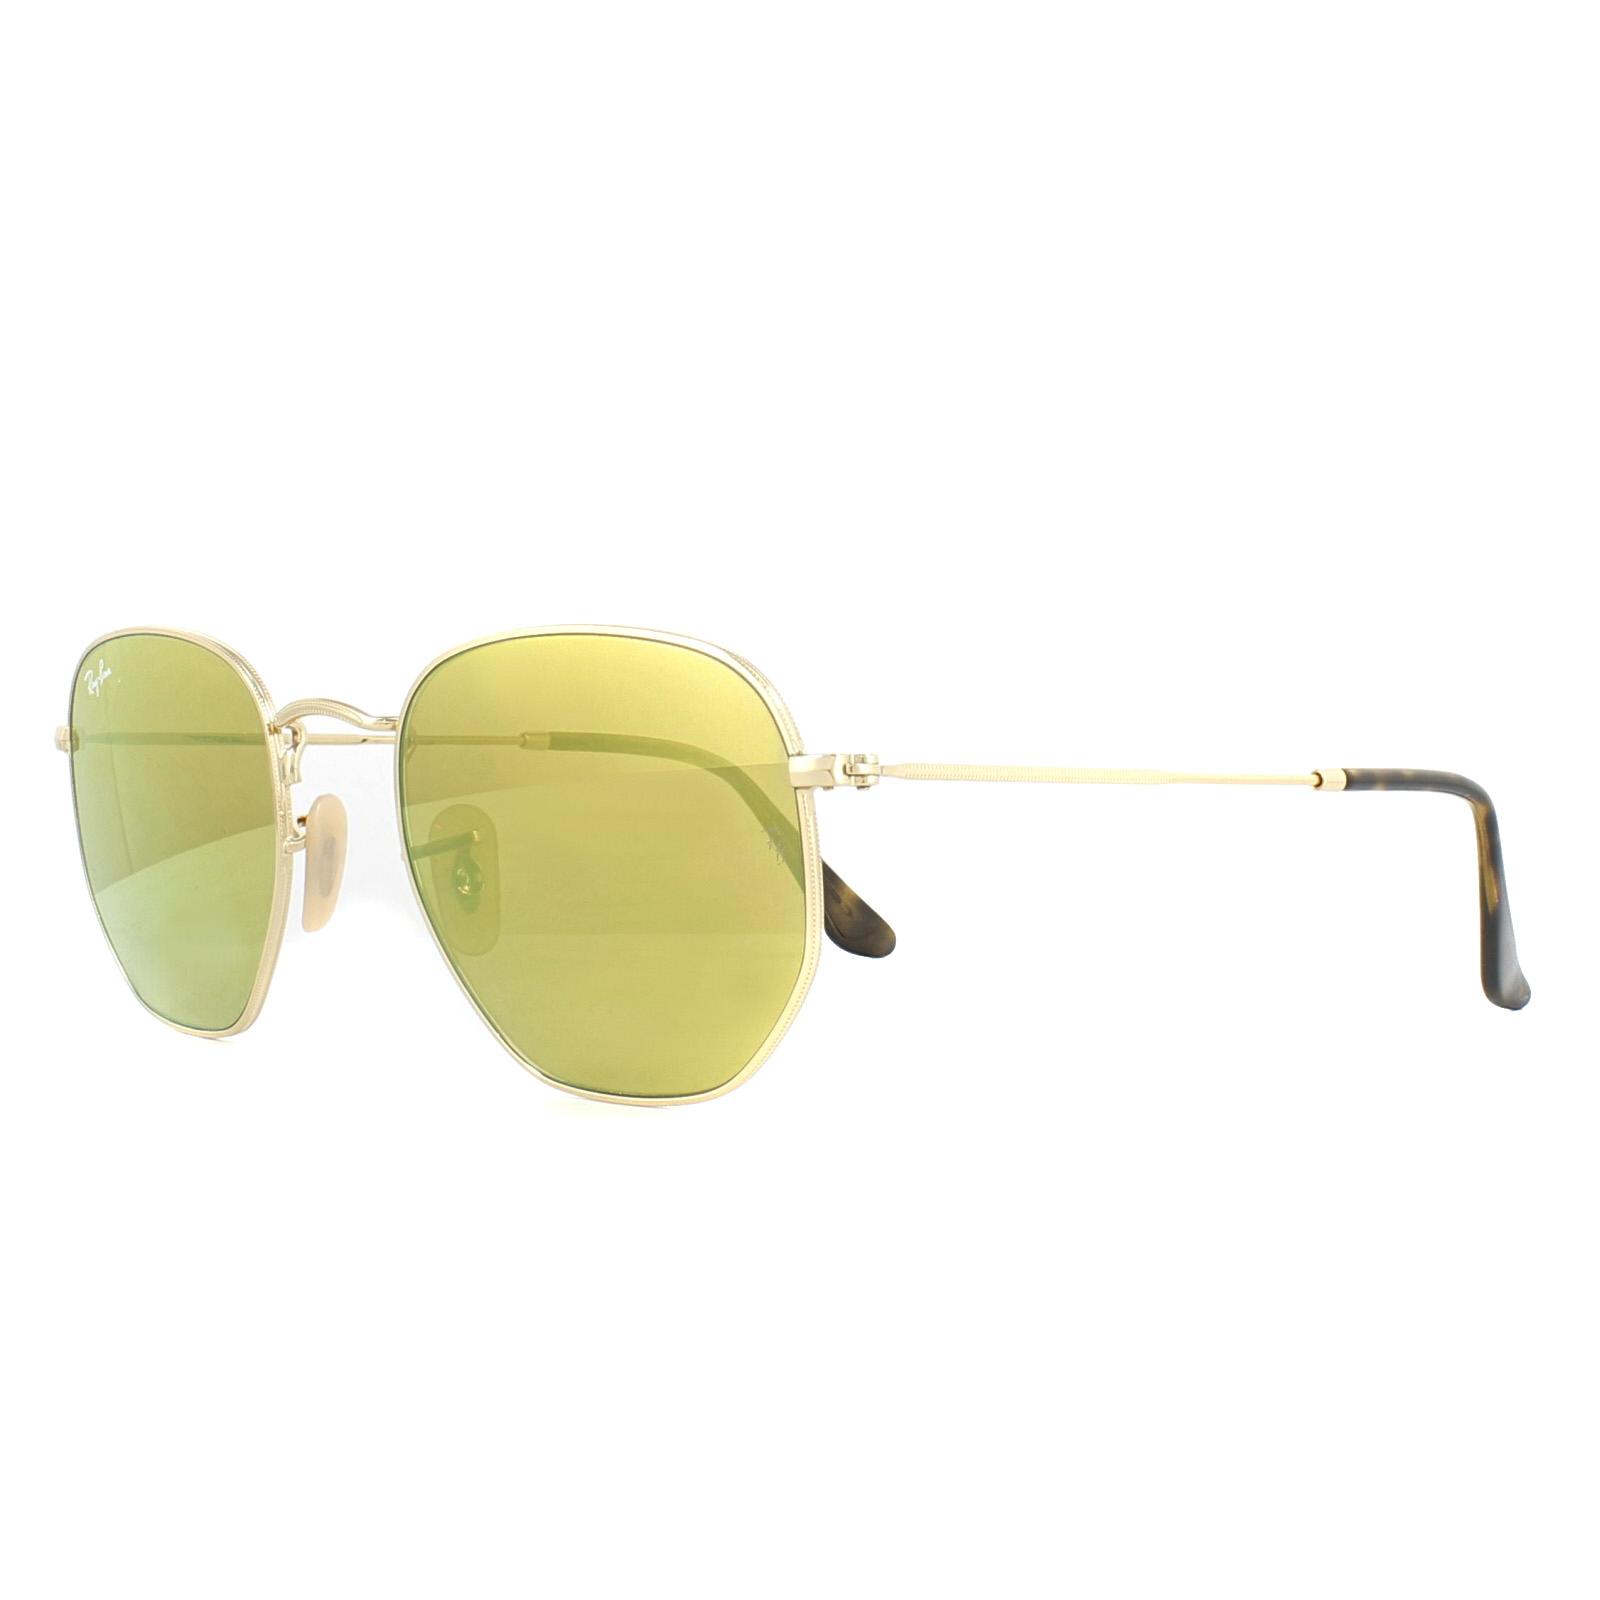 13055dbcf2f3a Sentinel Ray-Ban Sunglasses Hexagonal 3548N 001 93 Gold Yellow Mirror 54mm